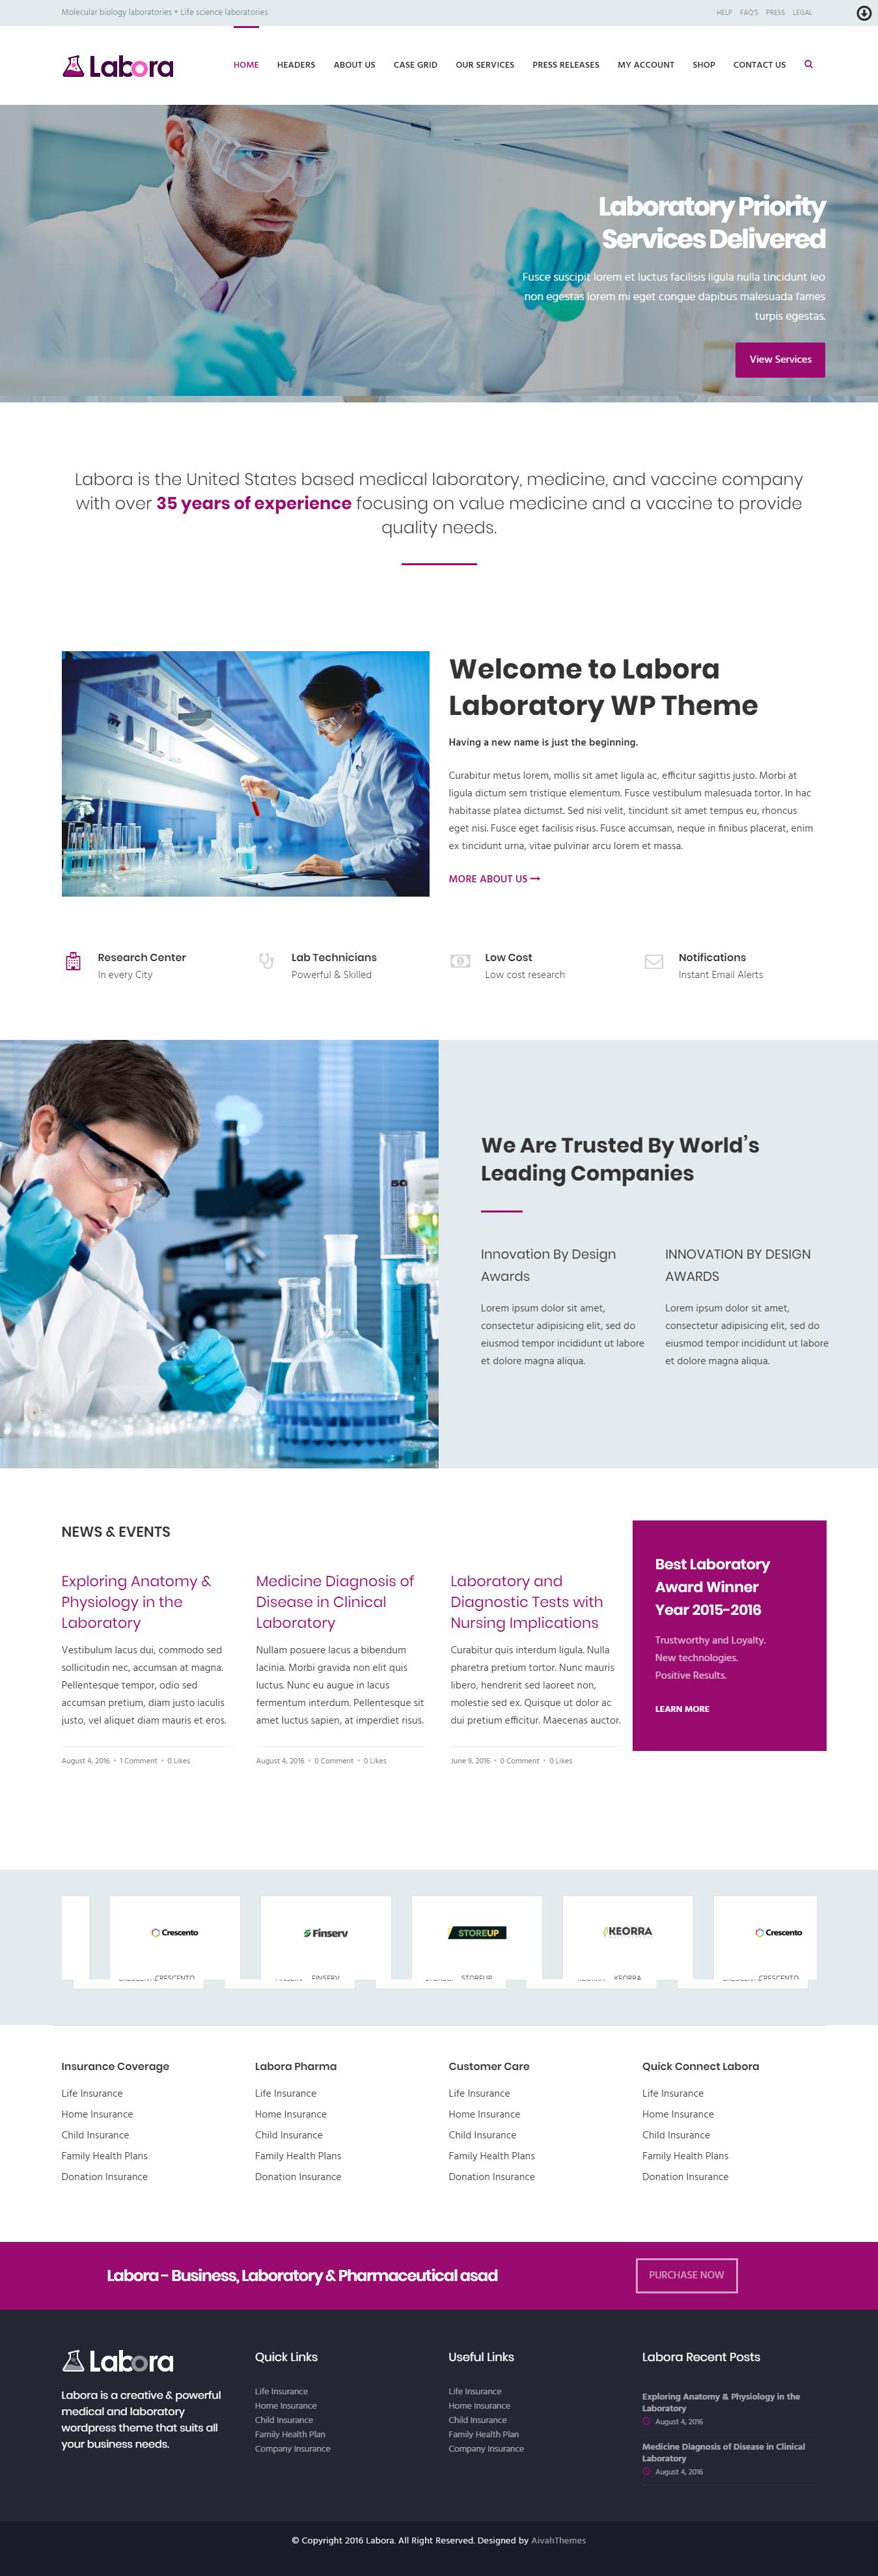 labora best premium science wordpress theme - 10+ Best Premium Science WordPress Themes